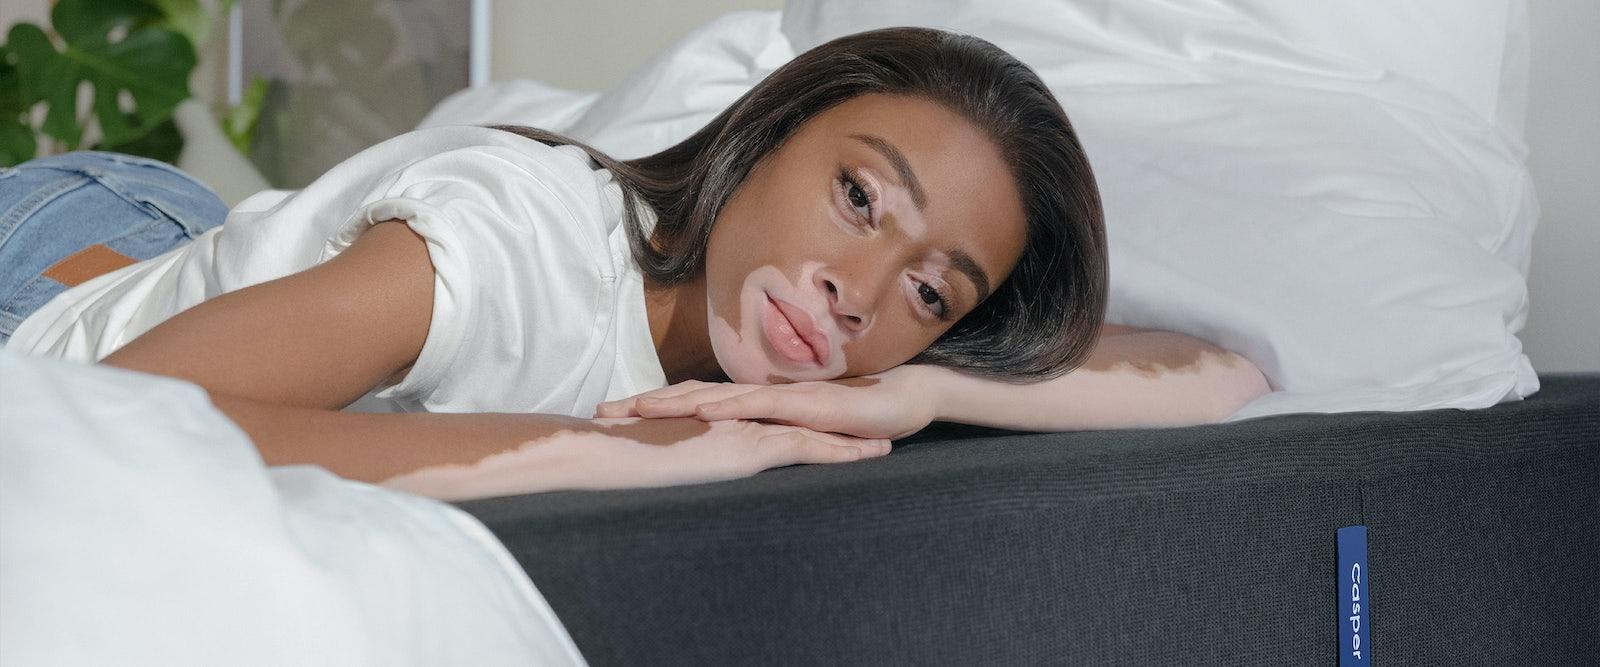 casper essential online kaufen optimierter aufbau zum fairen preis casper. Black Bedroom Furniture Sets. Home Design Ideas